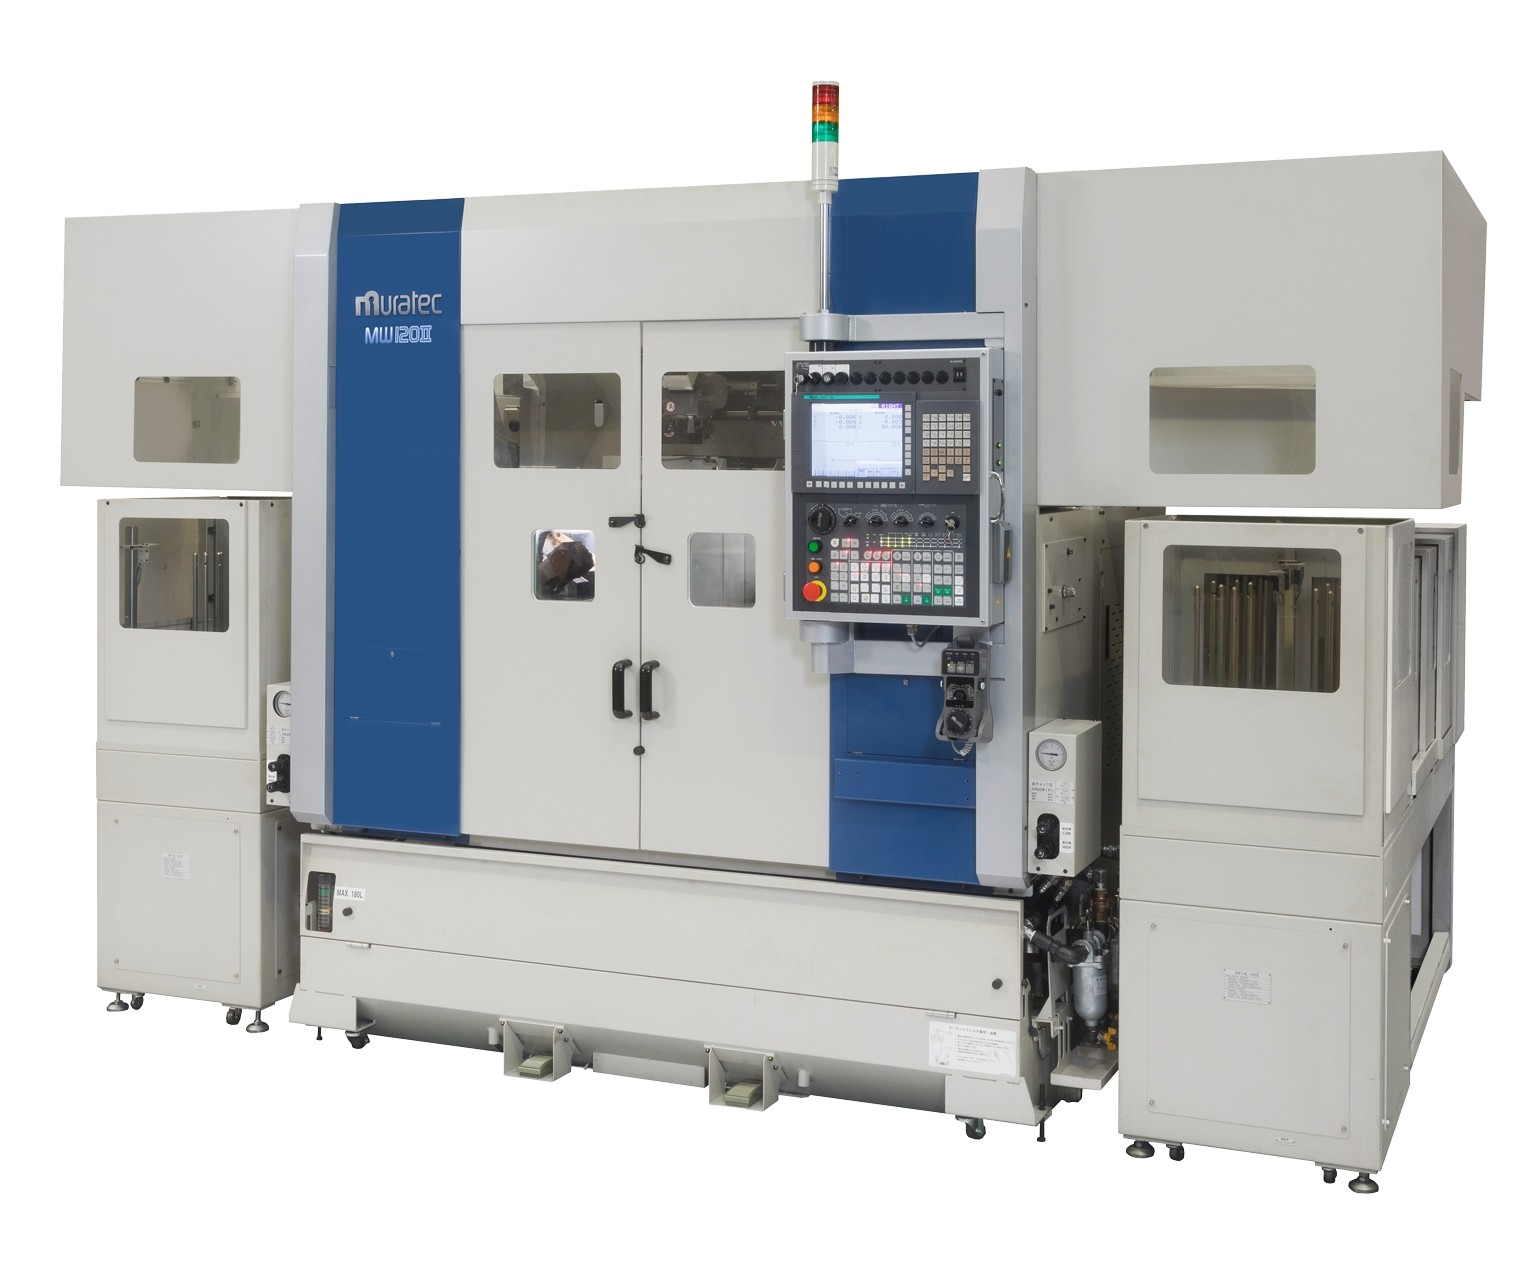 Murata Machinery's MW120II